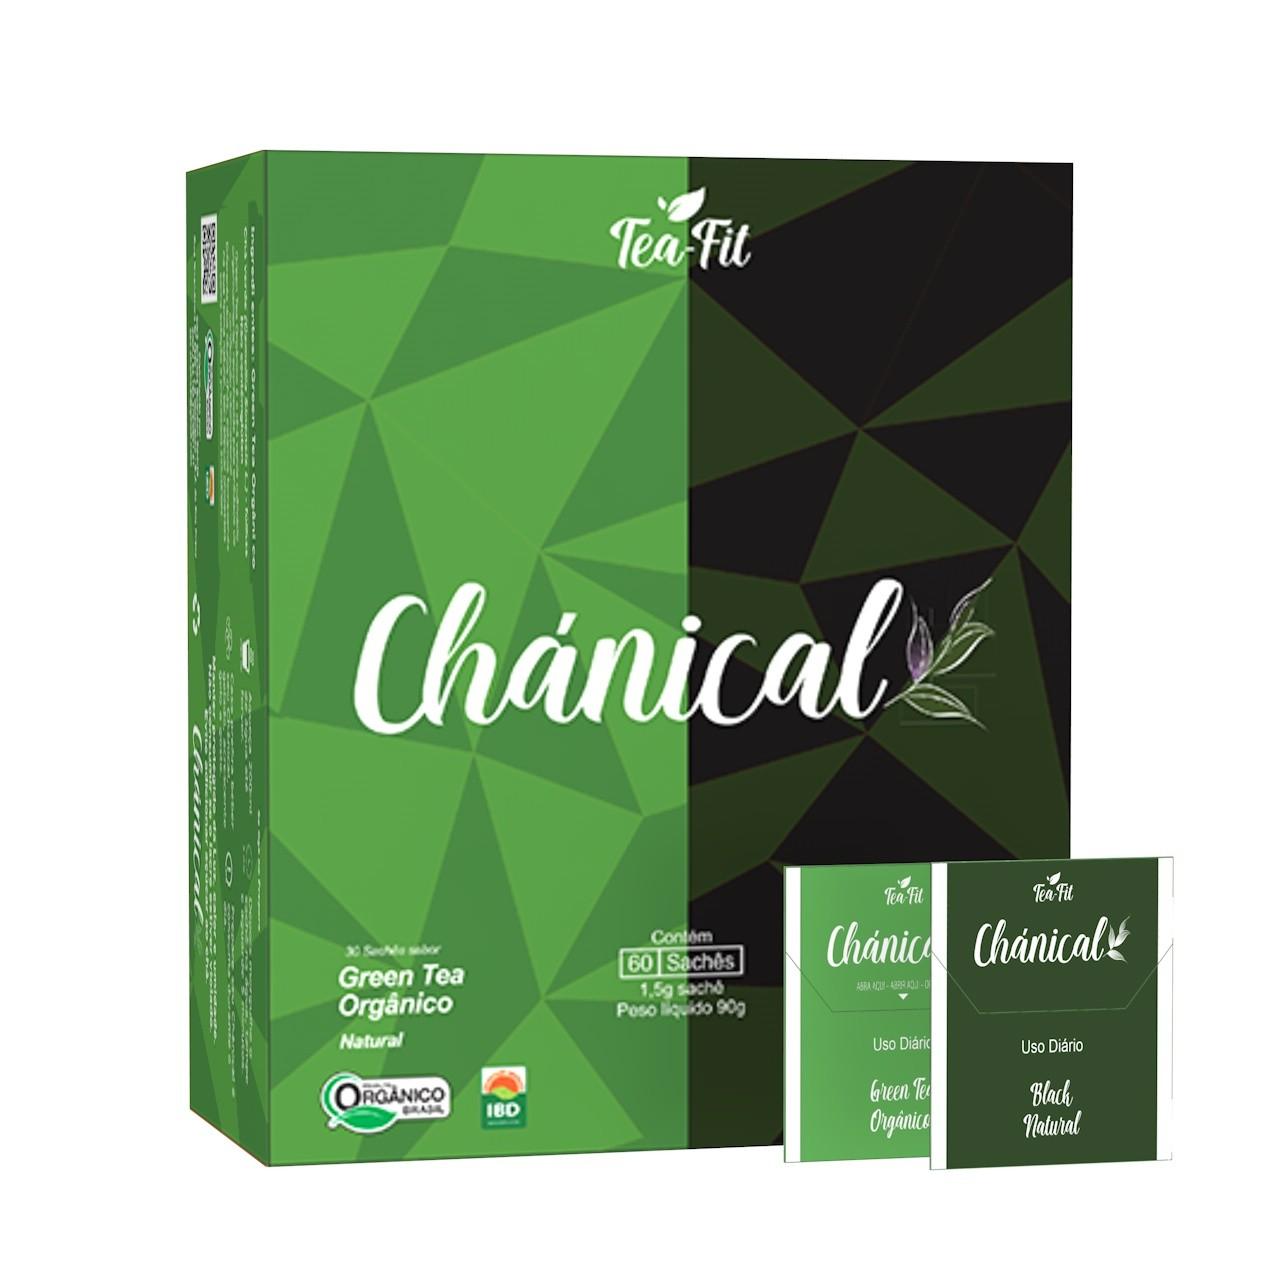 Chánical Tea-Fit 60 Saches Black Natural e Green Tea Orgânico  - KFit Nutrition